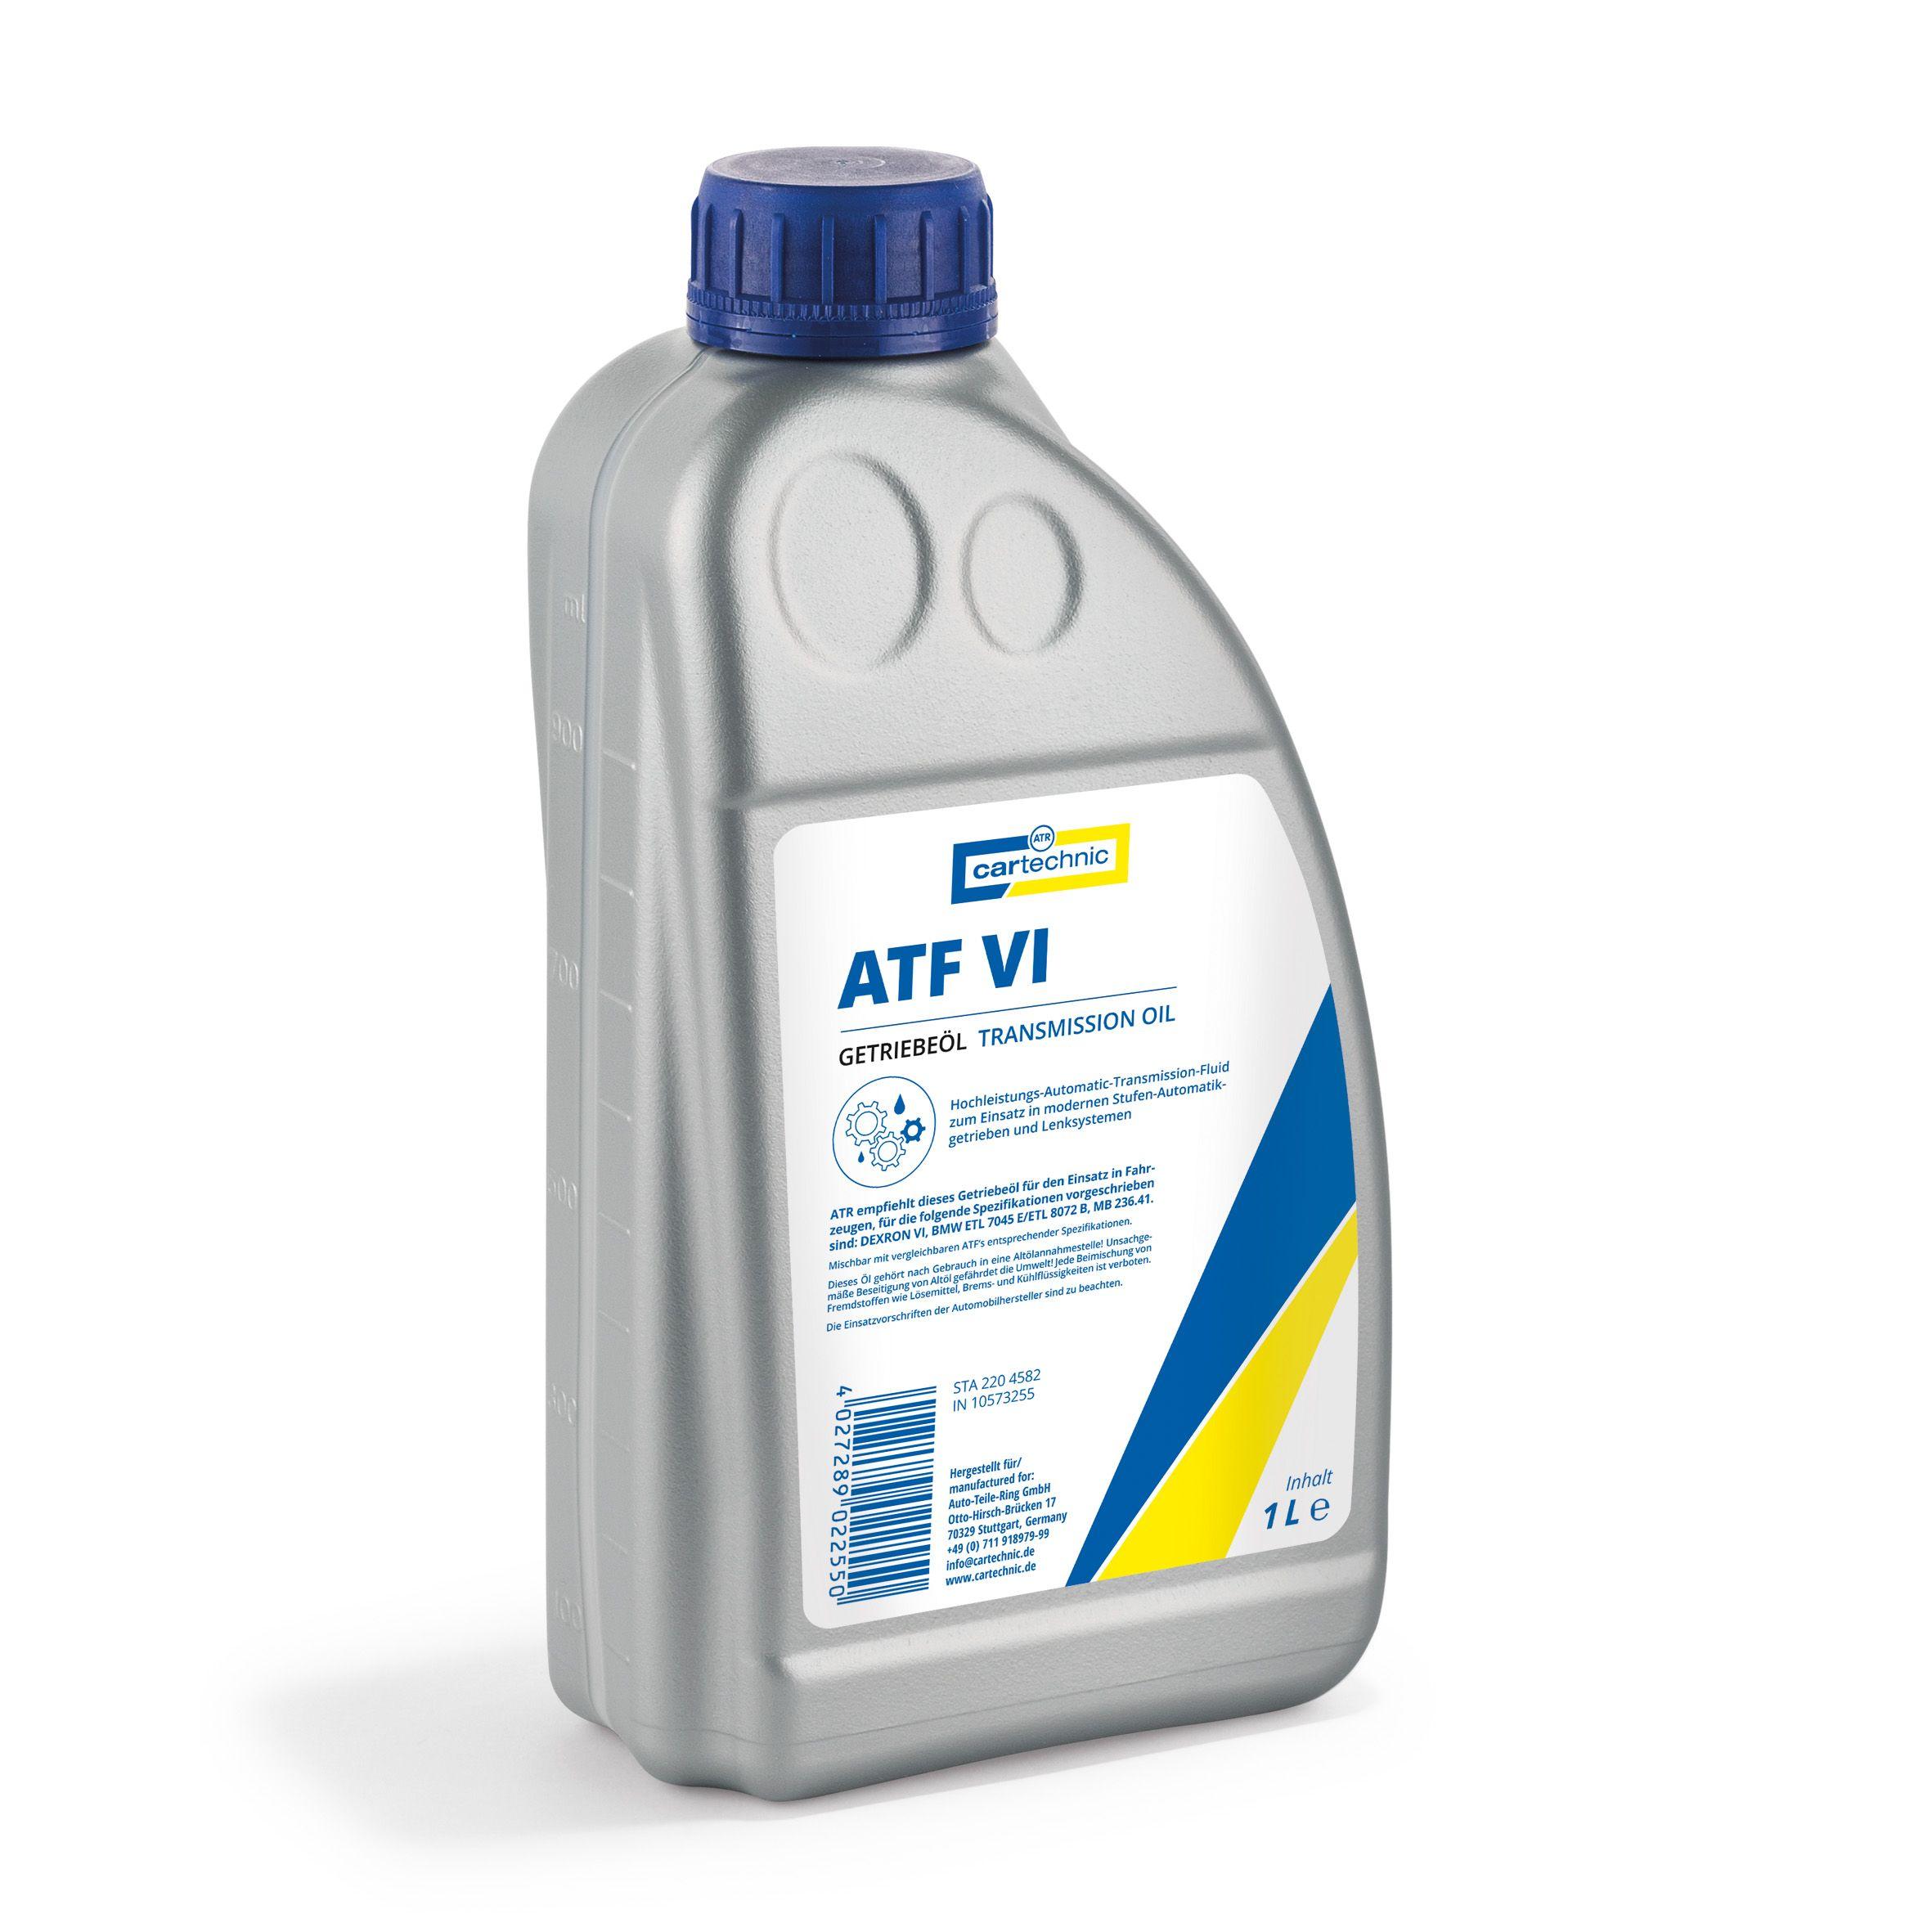 CARTECHRO Getriebeöl ATF VI 1 Liter 25036-114-J2